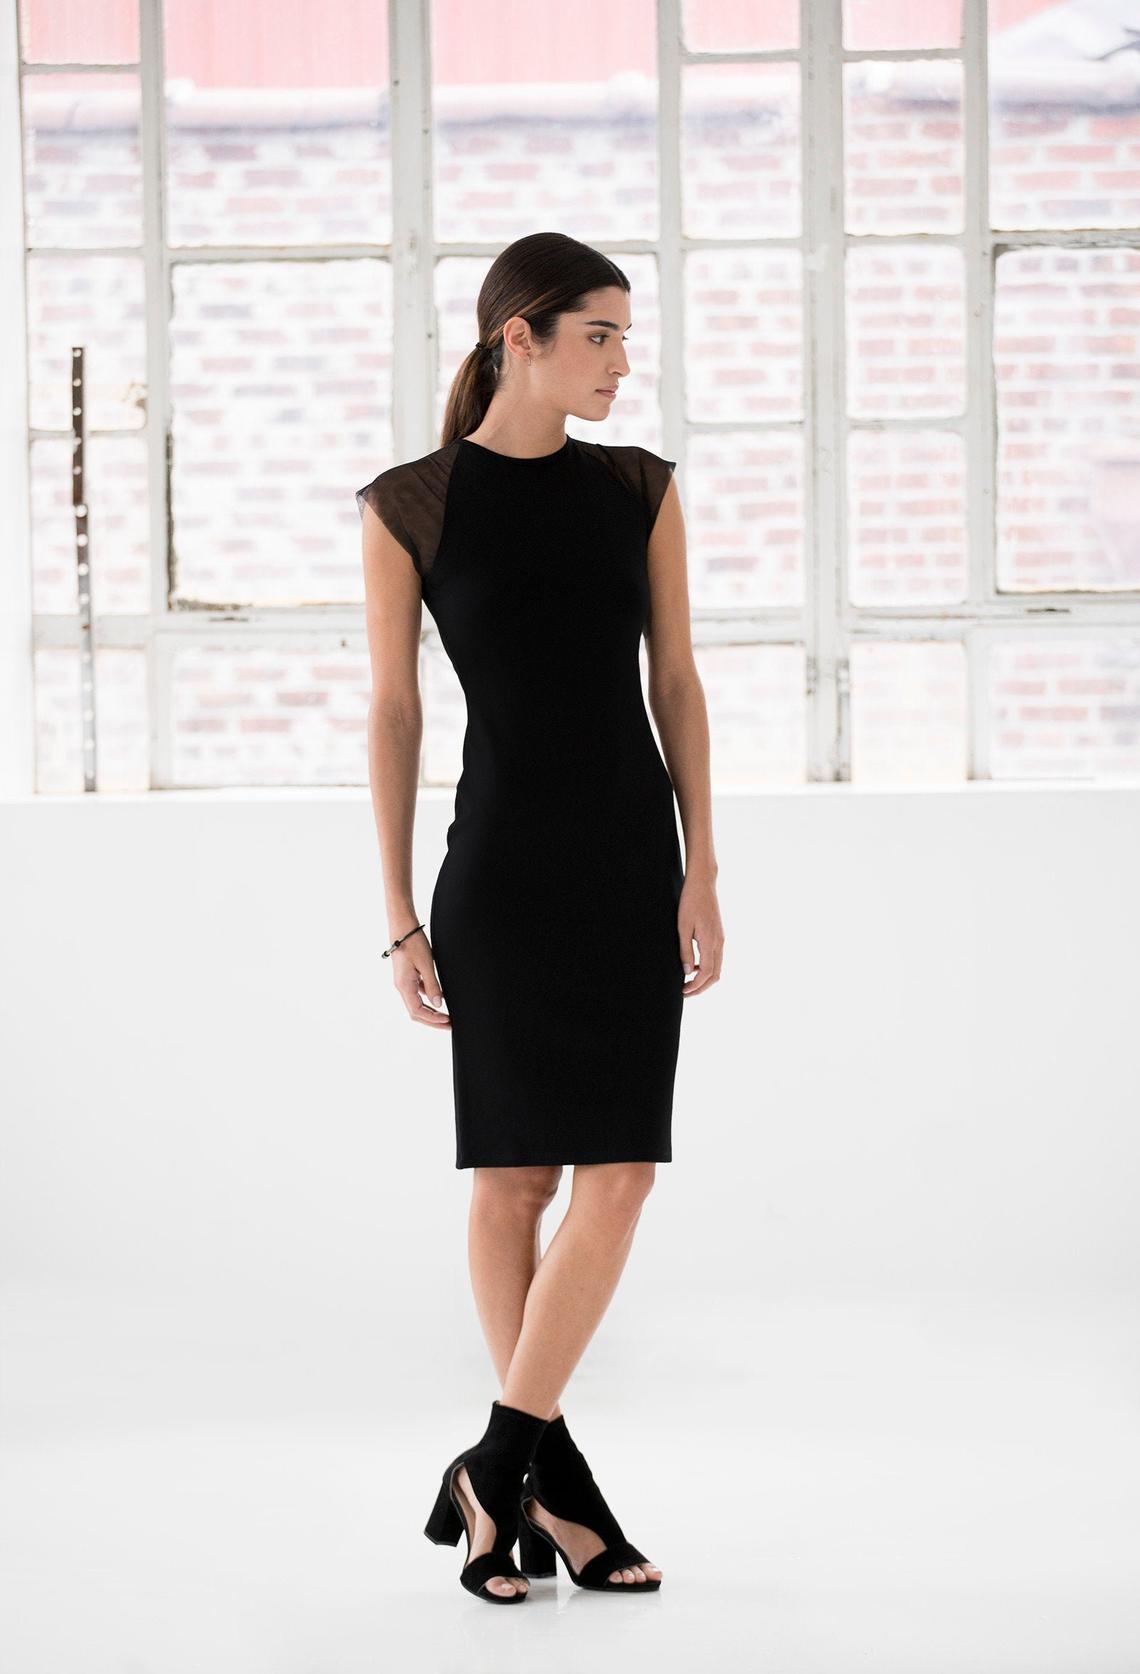 Black Jersey Dress, Black Cocktail Dress, Black Party Dress, Basic Black Dress, Black Clothing, All Occasion Dress, Hallie Dress, MD1012